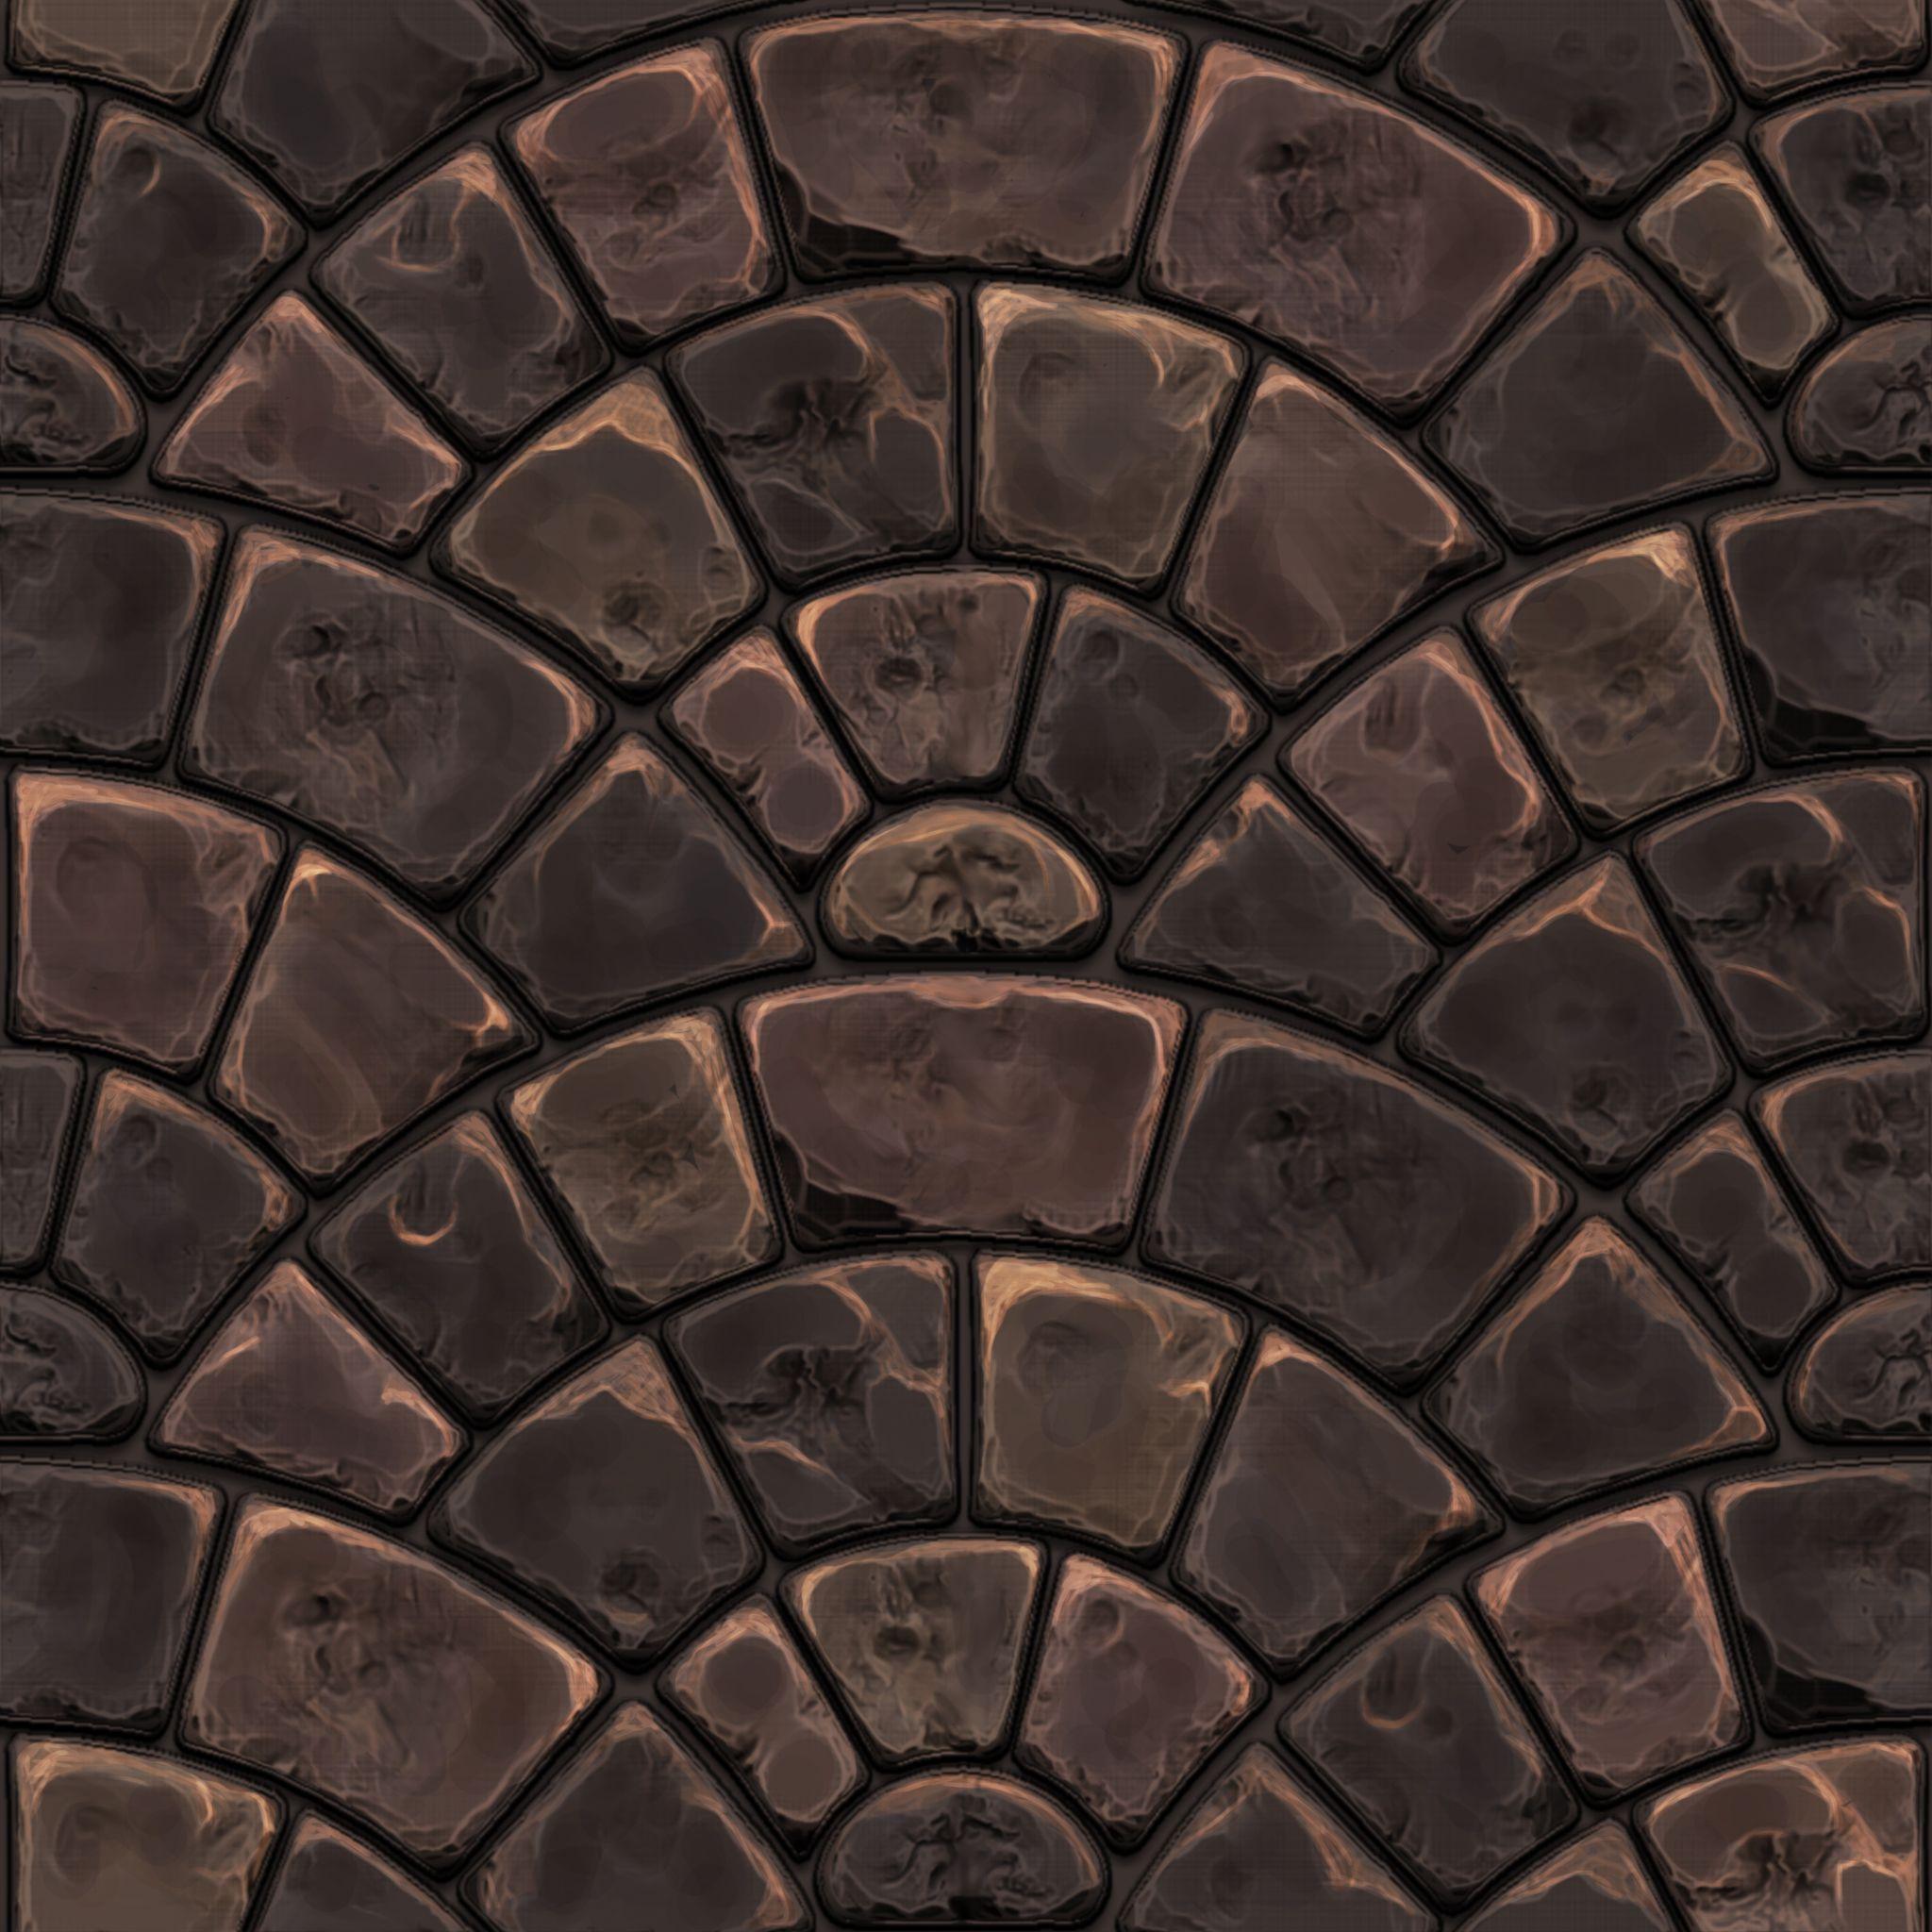 Handpainted stone pavement texture | 3D Inspiration | Pinterest ...